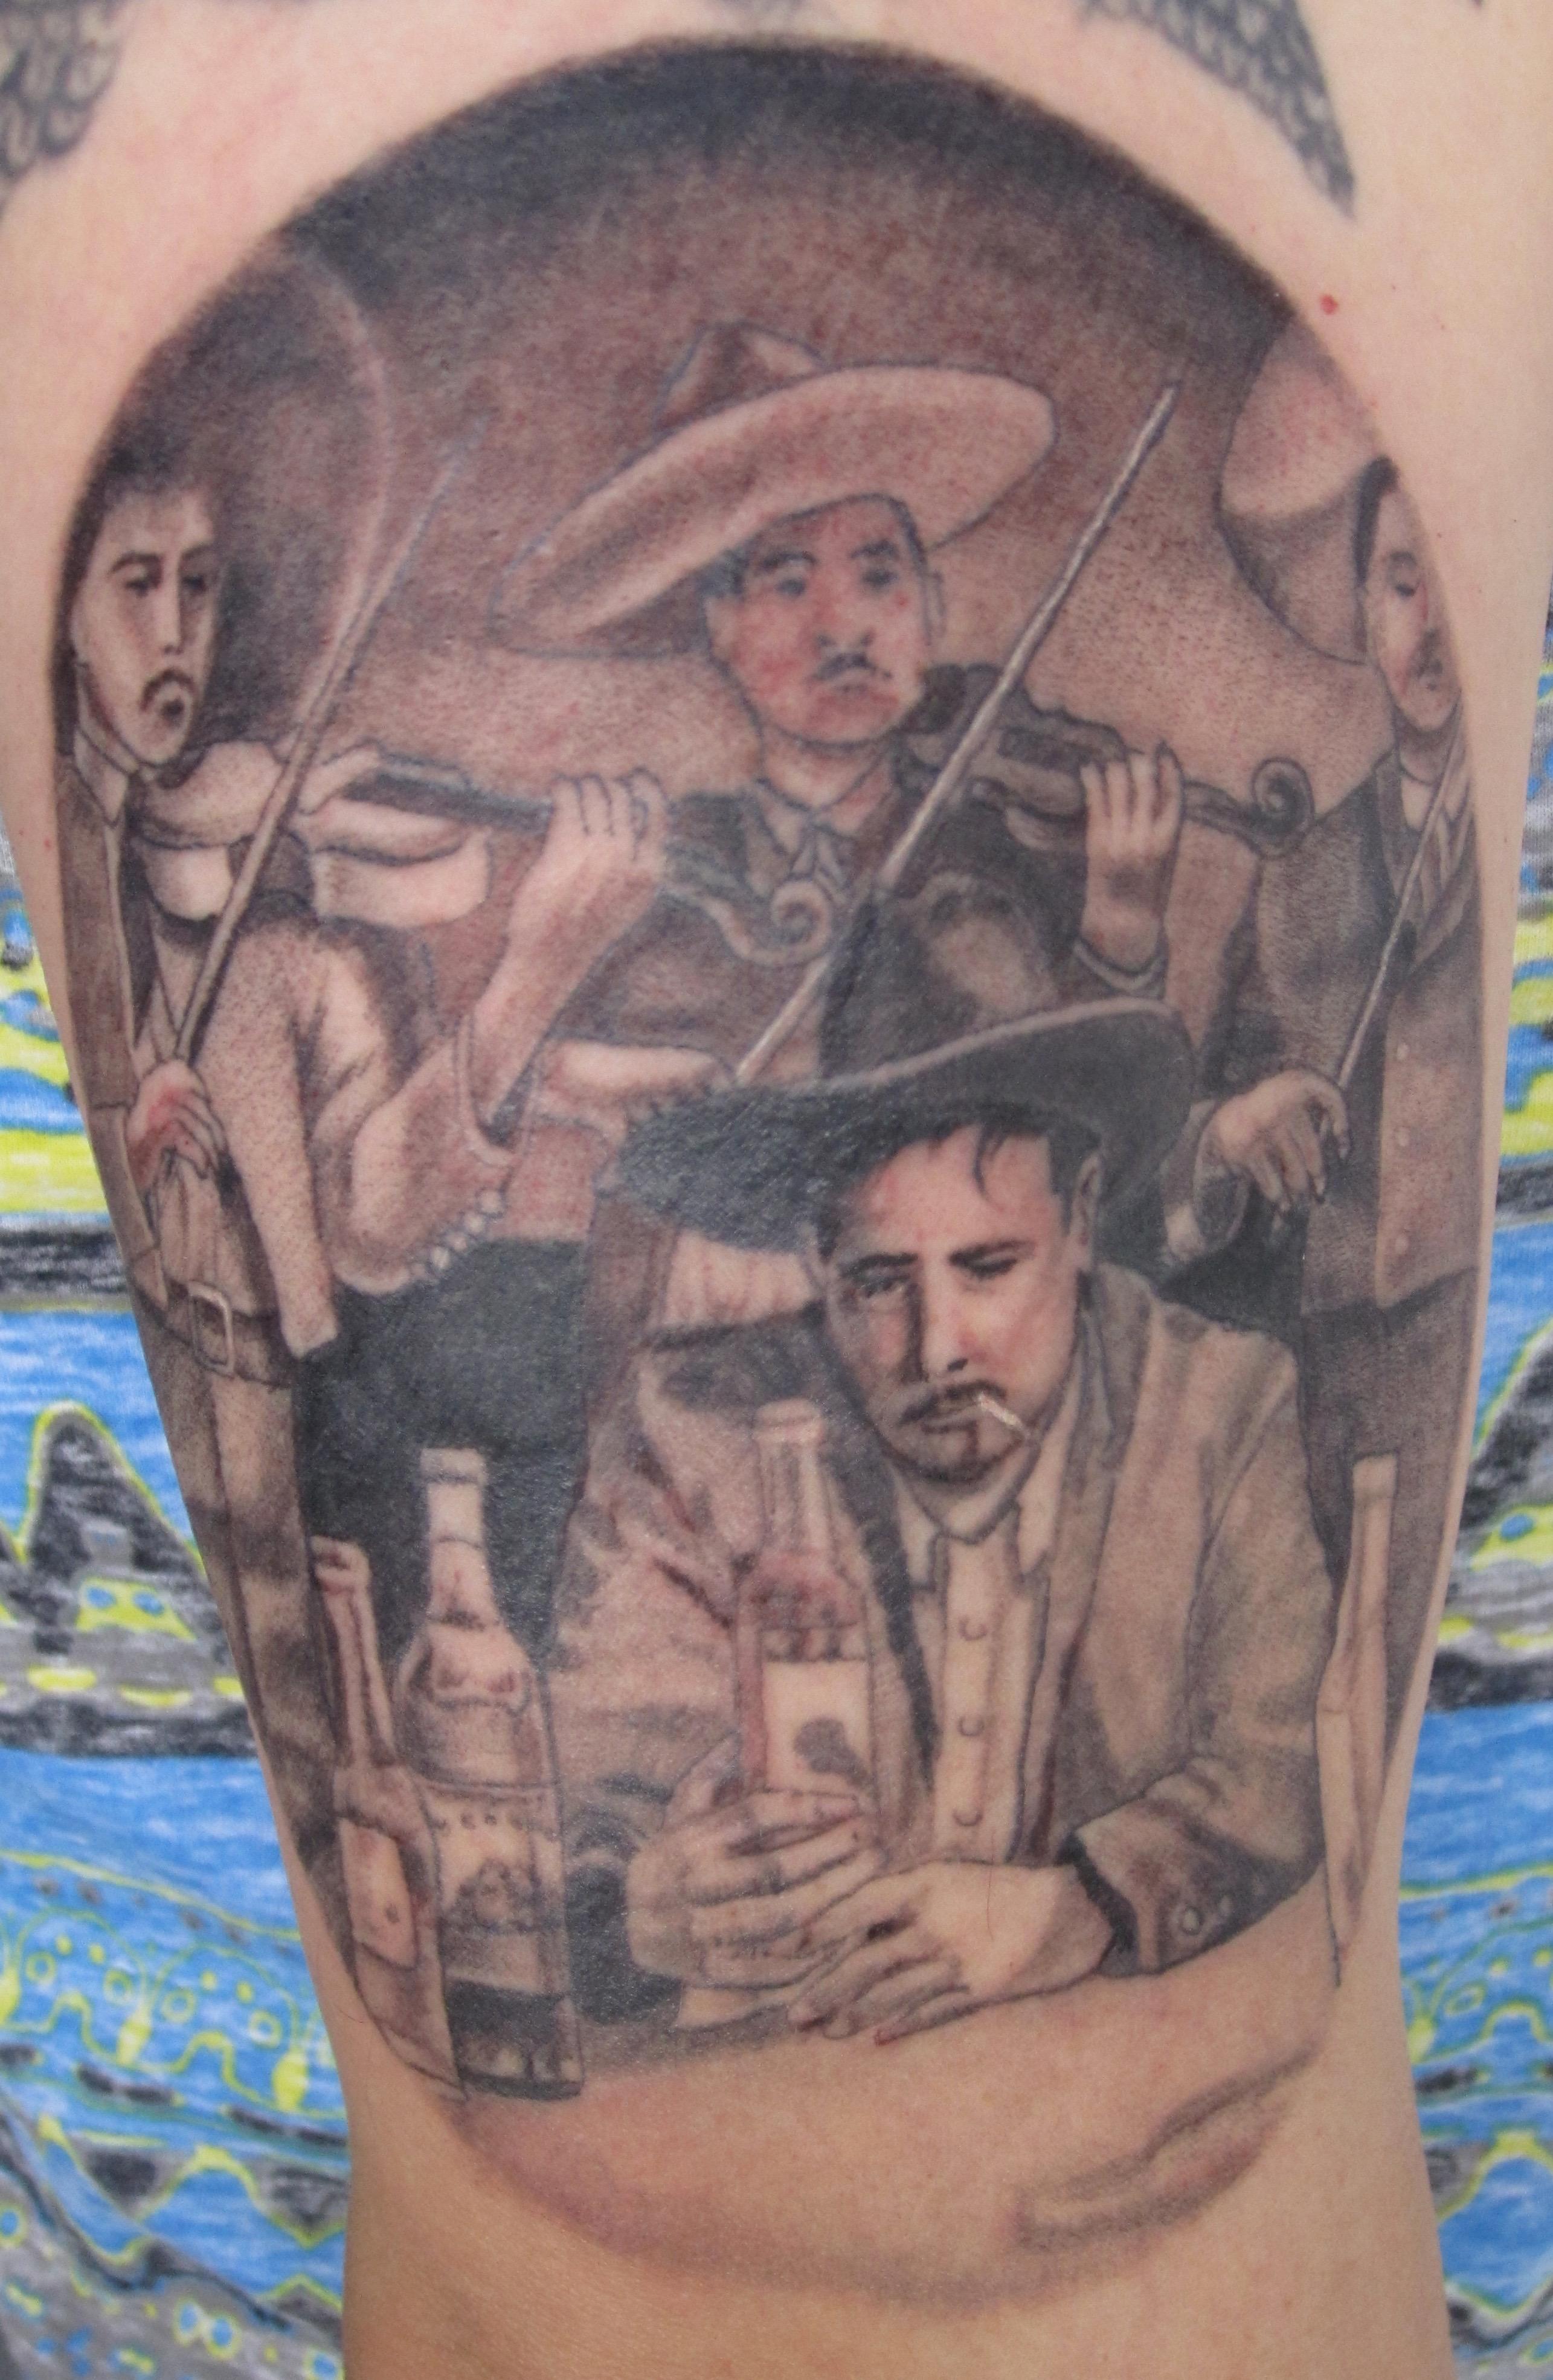 Pedro Infante tattoo, Karina Mayorga